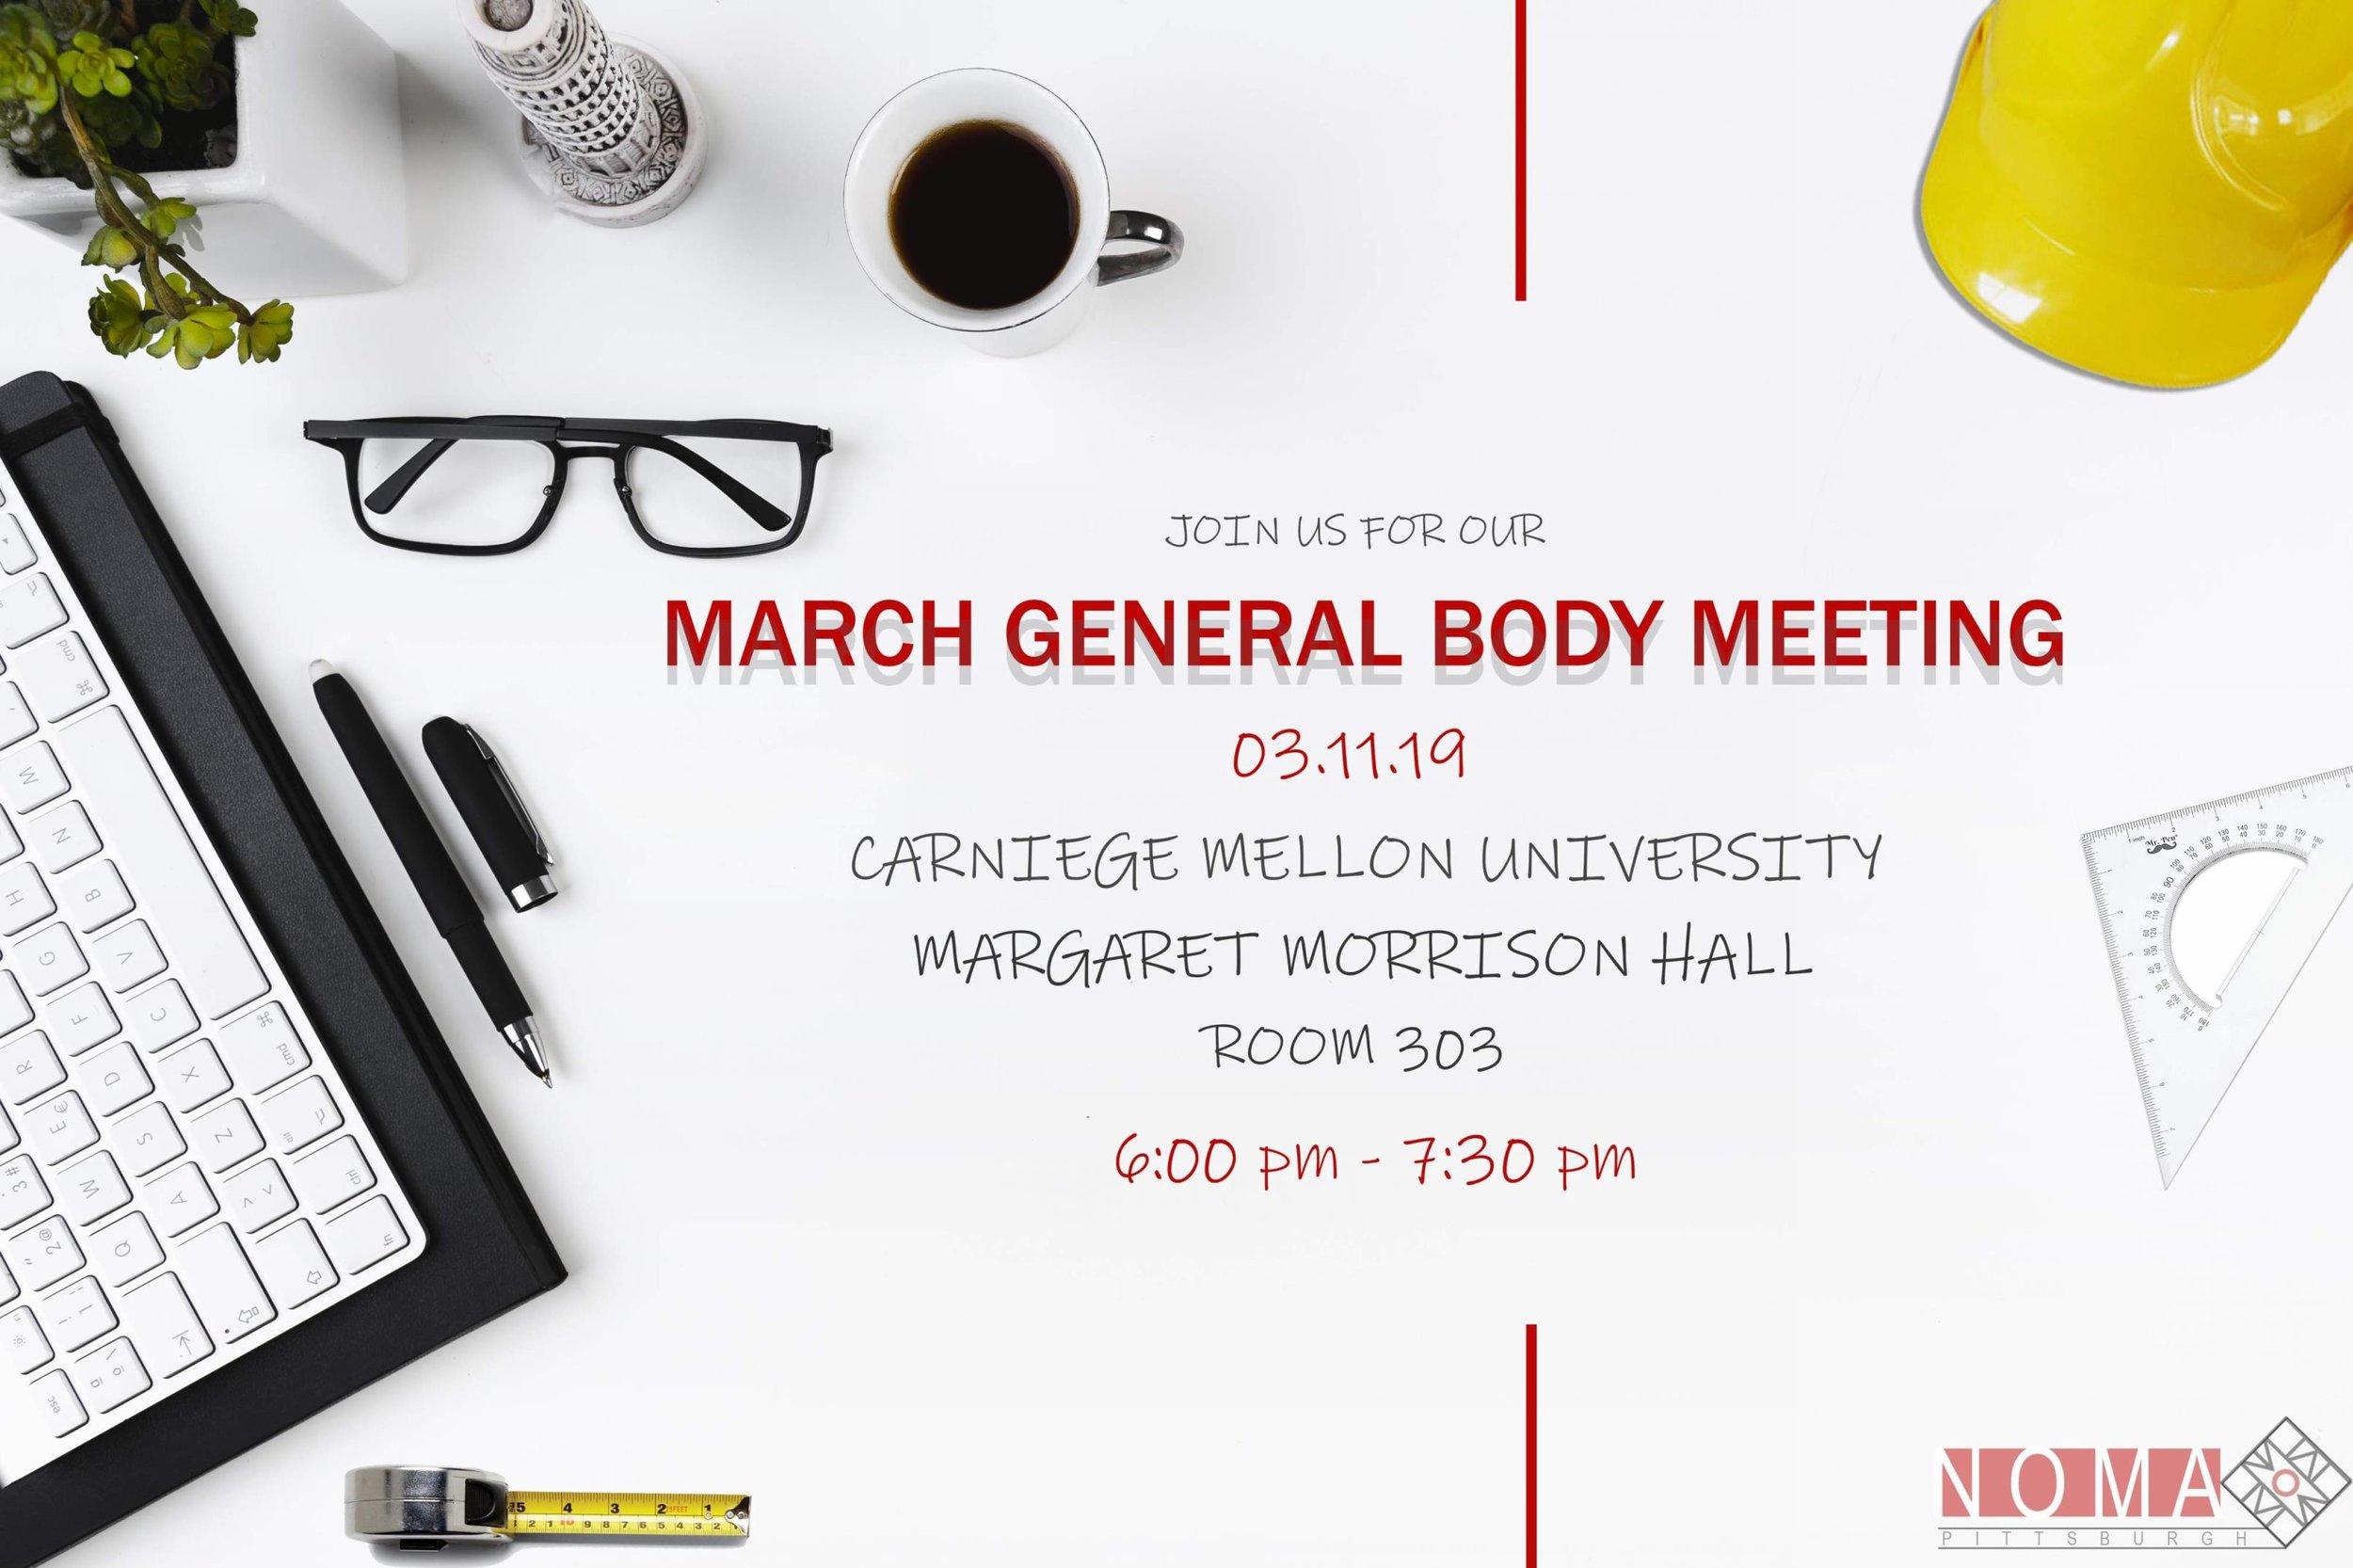 March General Body Meeting Flyer - Erica Cochran.jpg